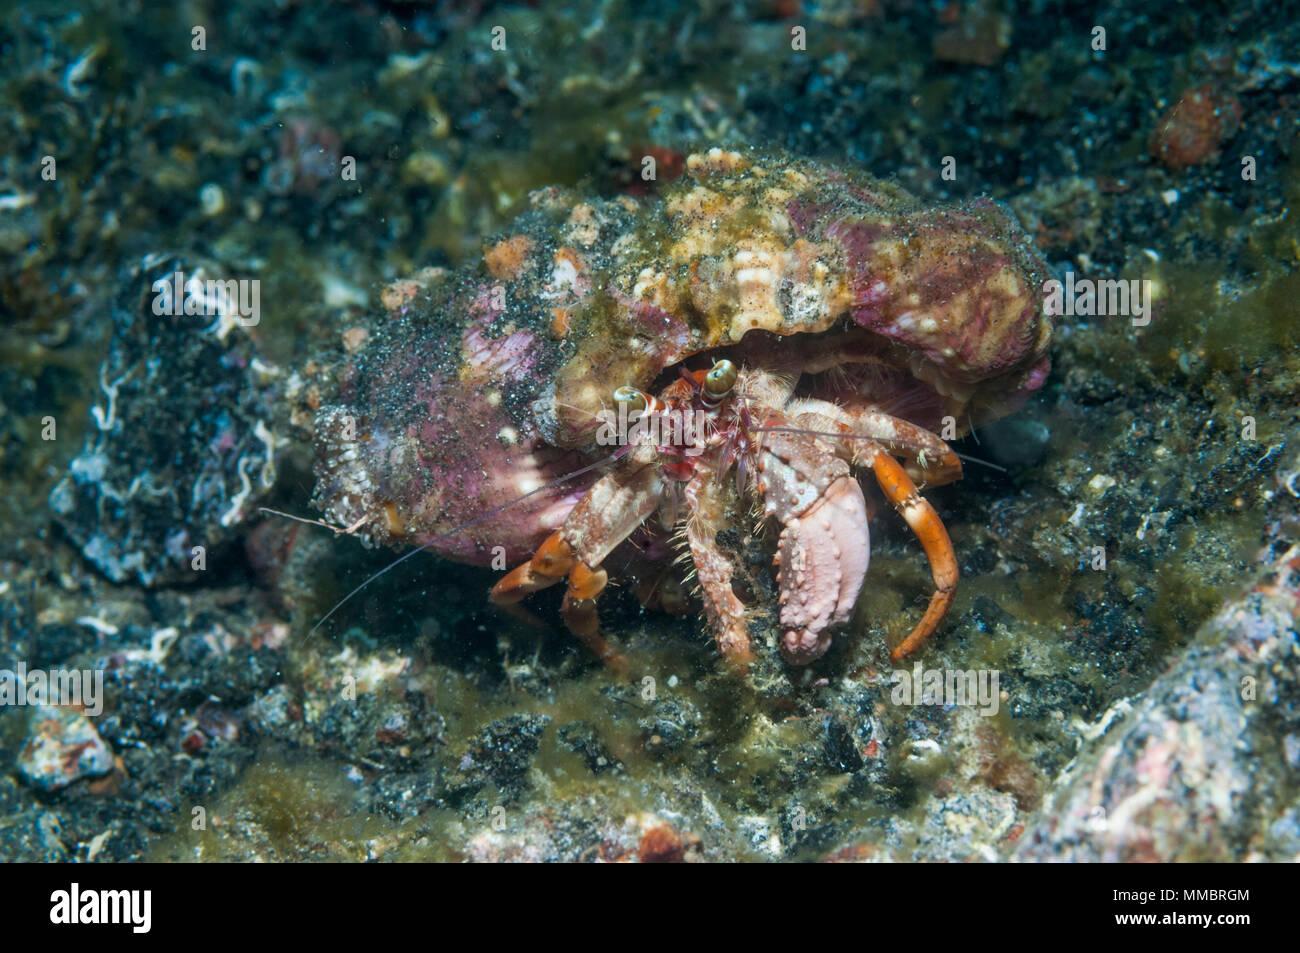 Jeweled anemone hermit crab [Dardanus gemmatus].  Lembeh Strait, North Sulawesi, Indonesia. - Stock Image